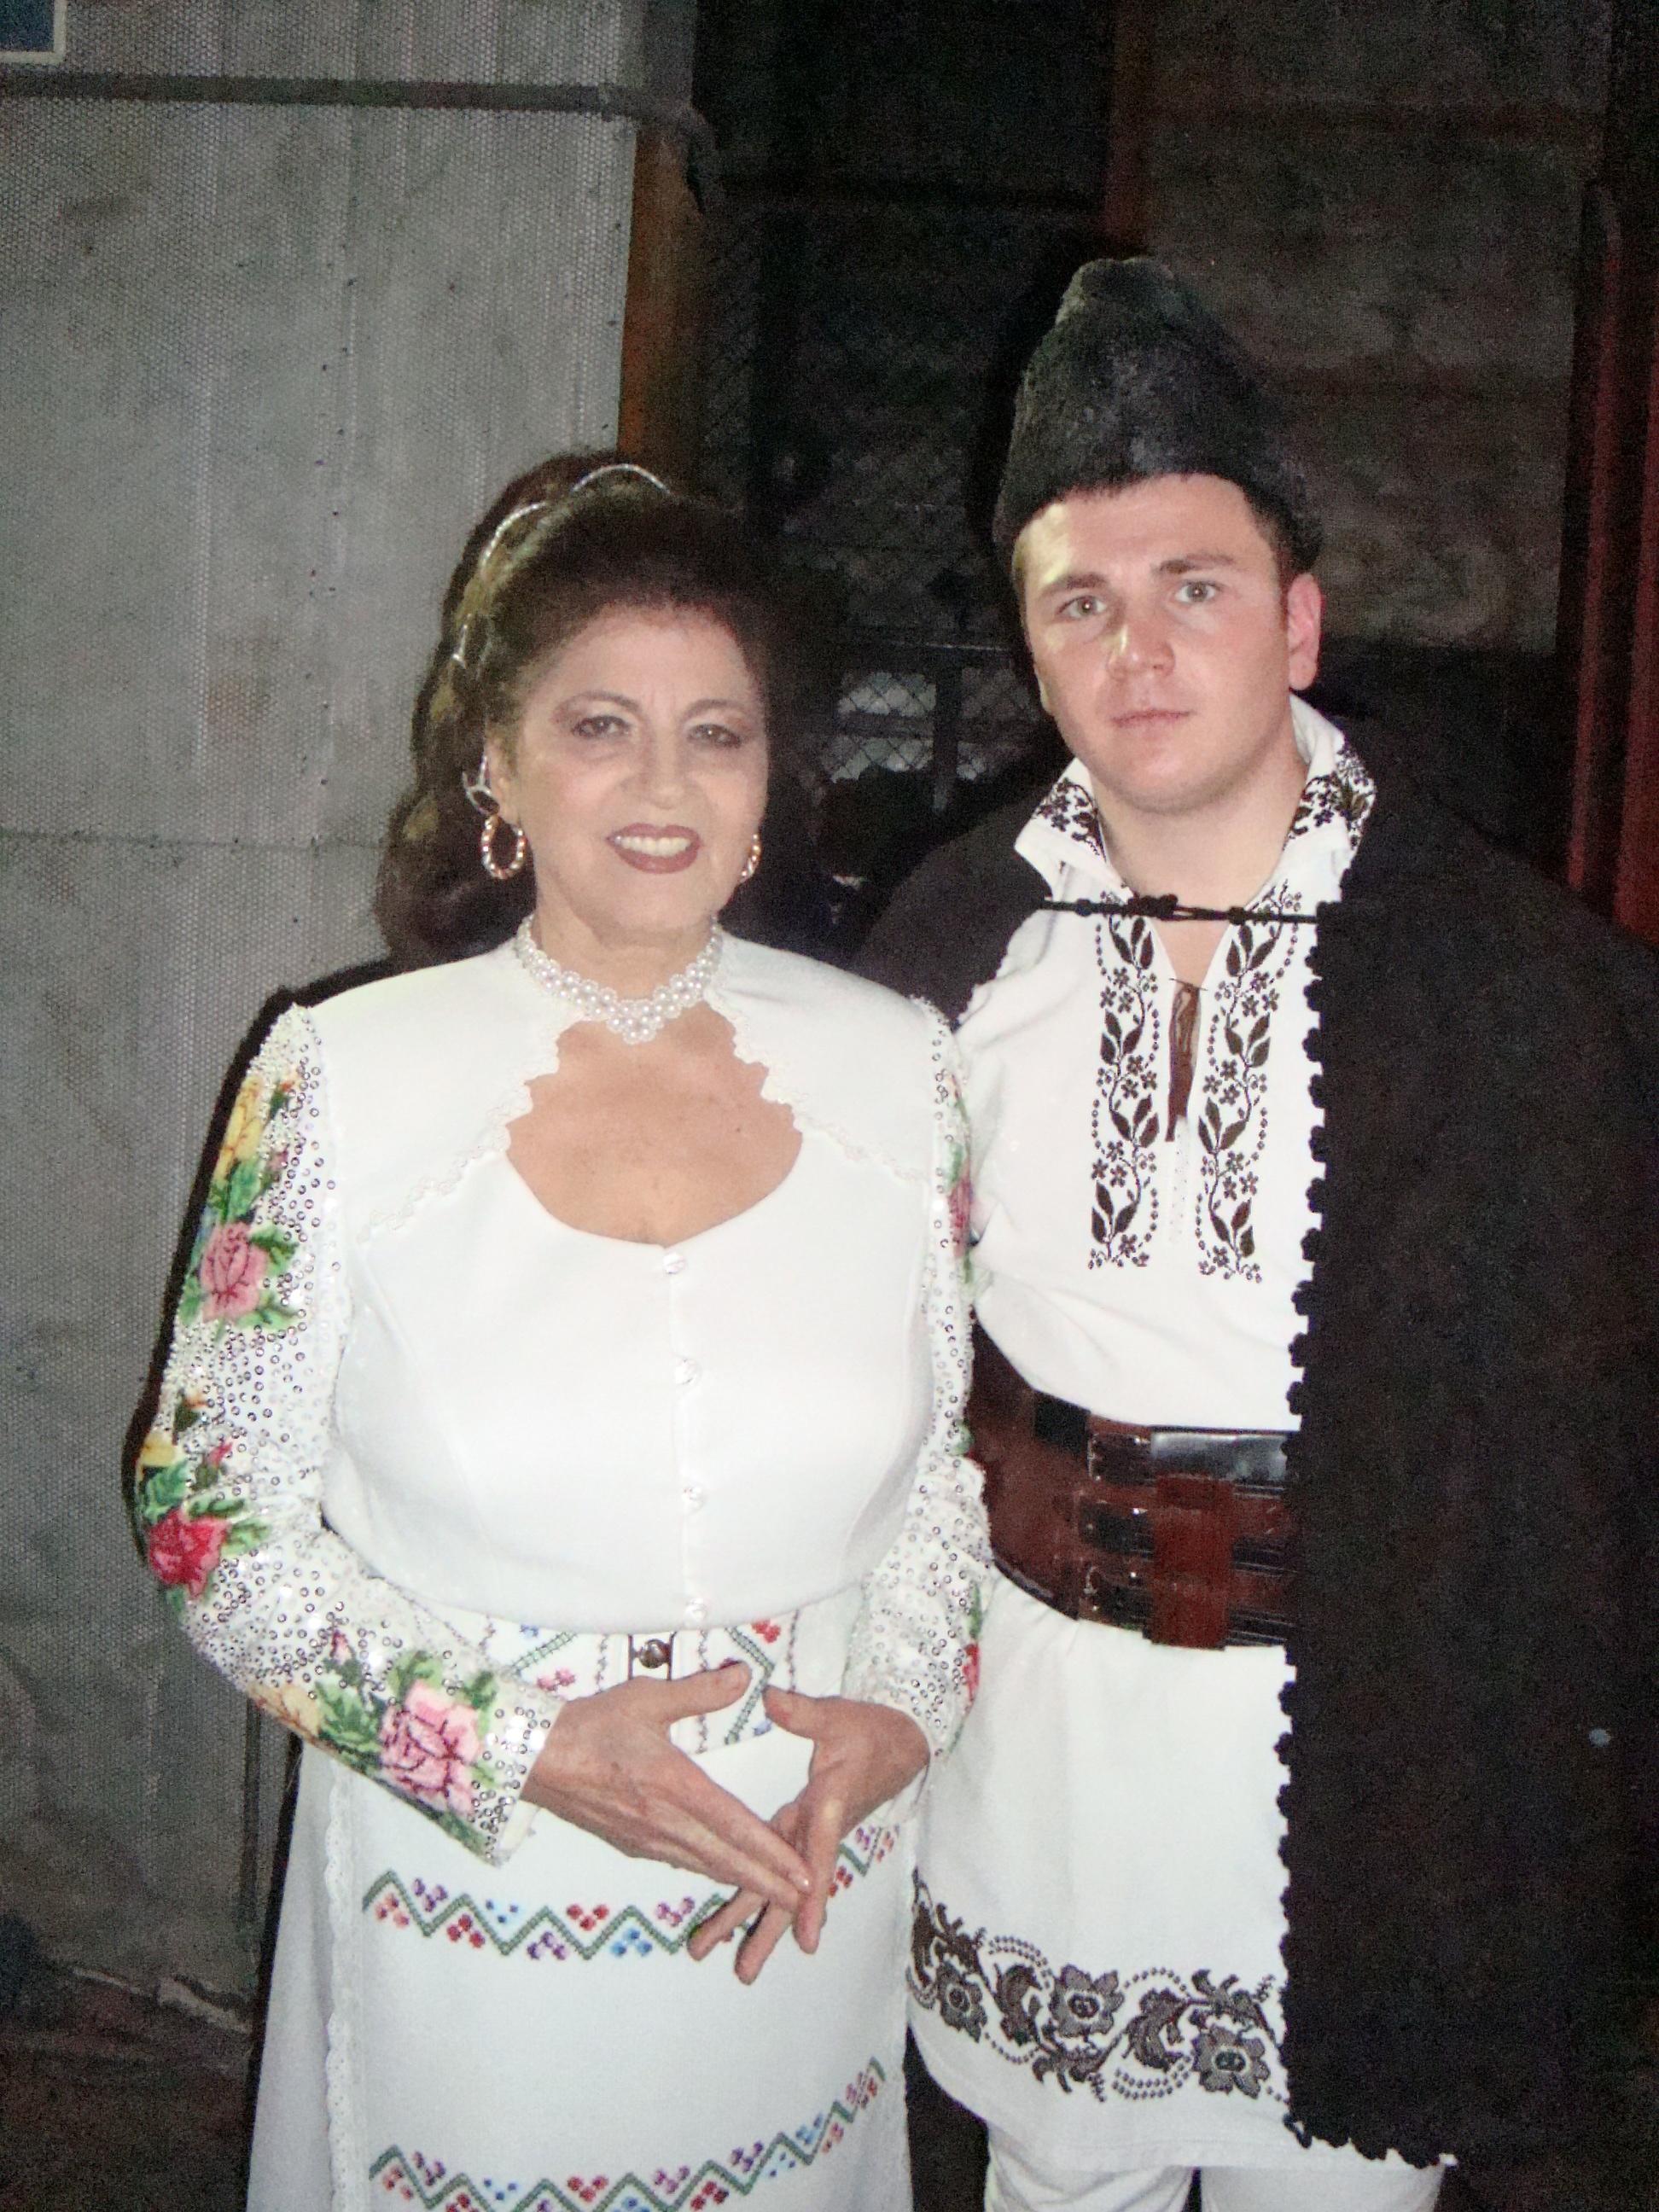 Cu doamna IRINA LOGHIN, 40 DE ANI AI LAUTARILOR (2010)